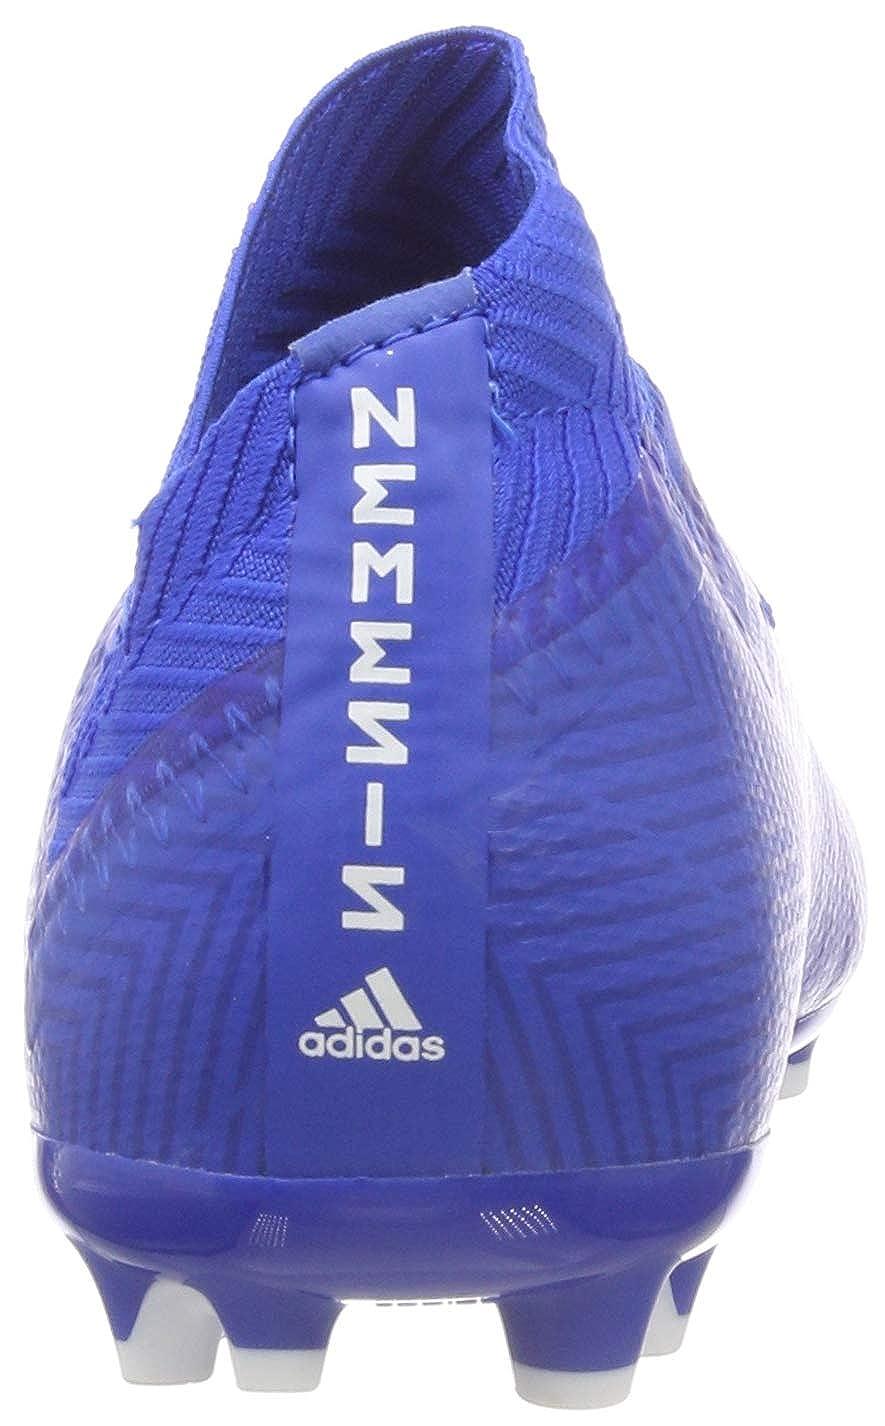 Adidas Unisex-Erwachsene AG Nemeziz 18.3 AG Unisex-Erwachsene Fußballschuhe 8fca41